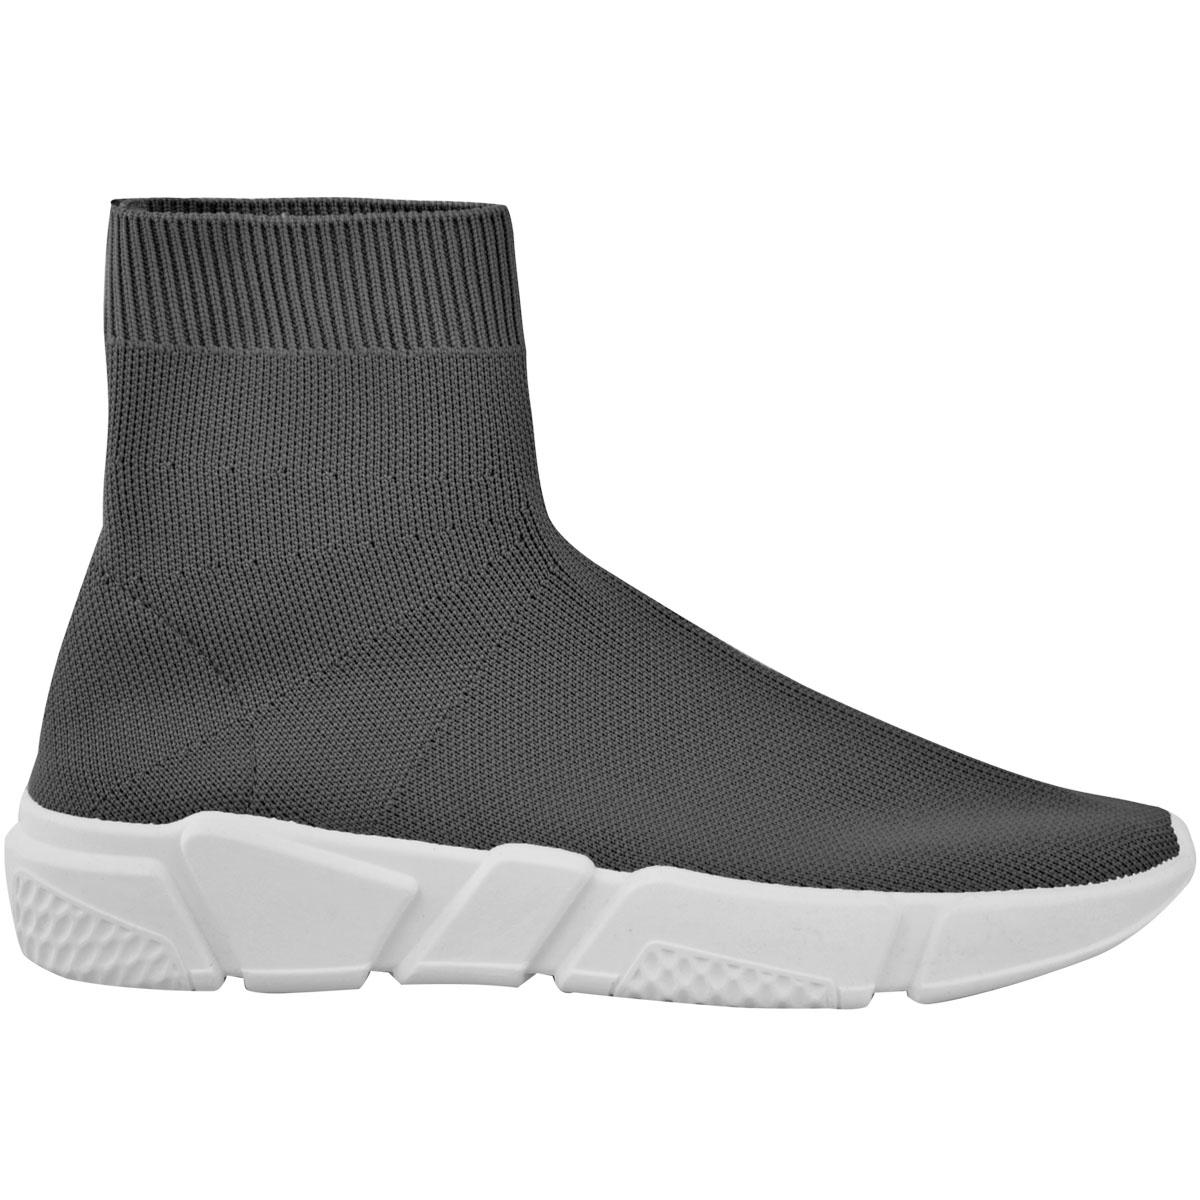 image Lady melissa sneakers socks feet worship